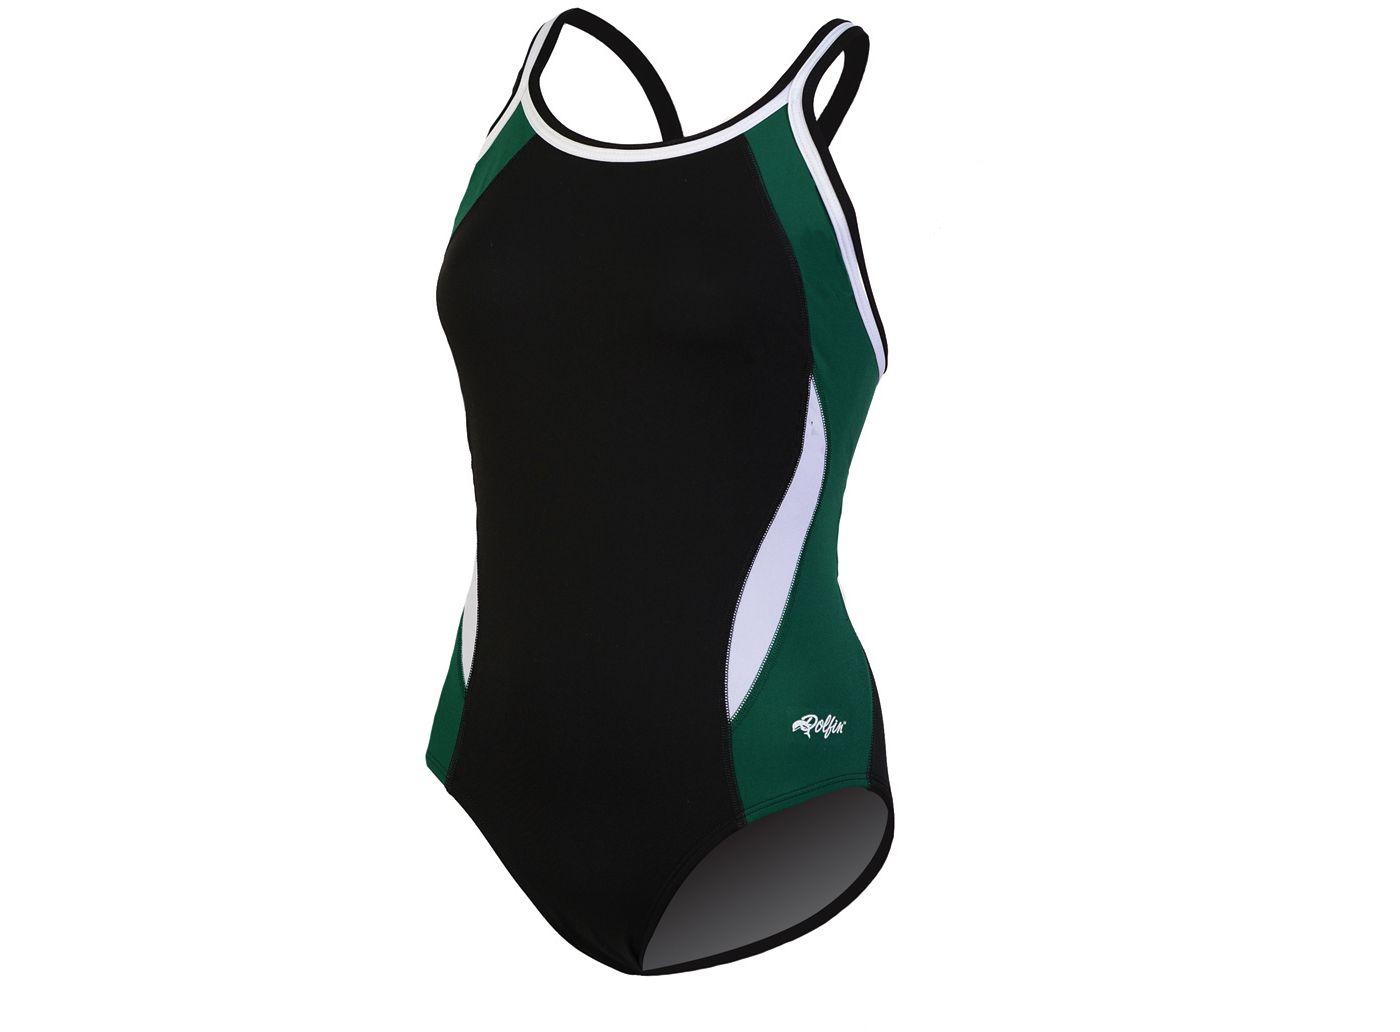 Dolfin Women's Chloroban Color Block DBX Back Swimsuit